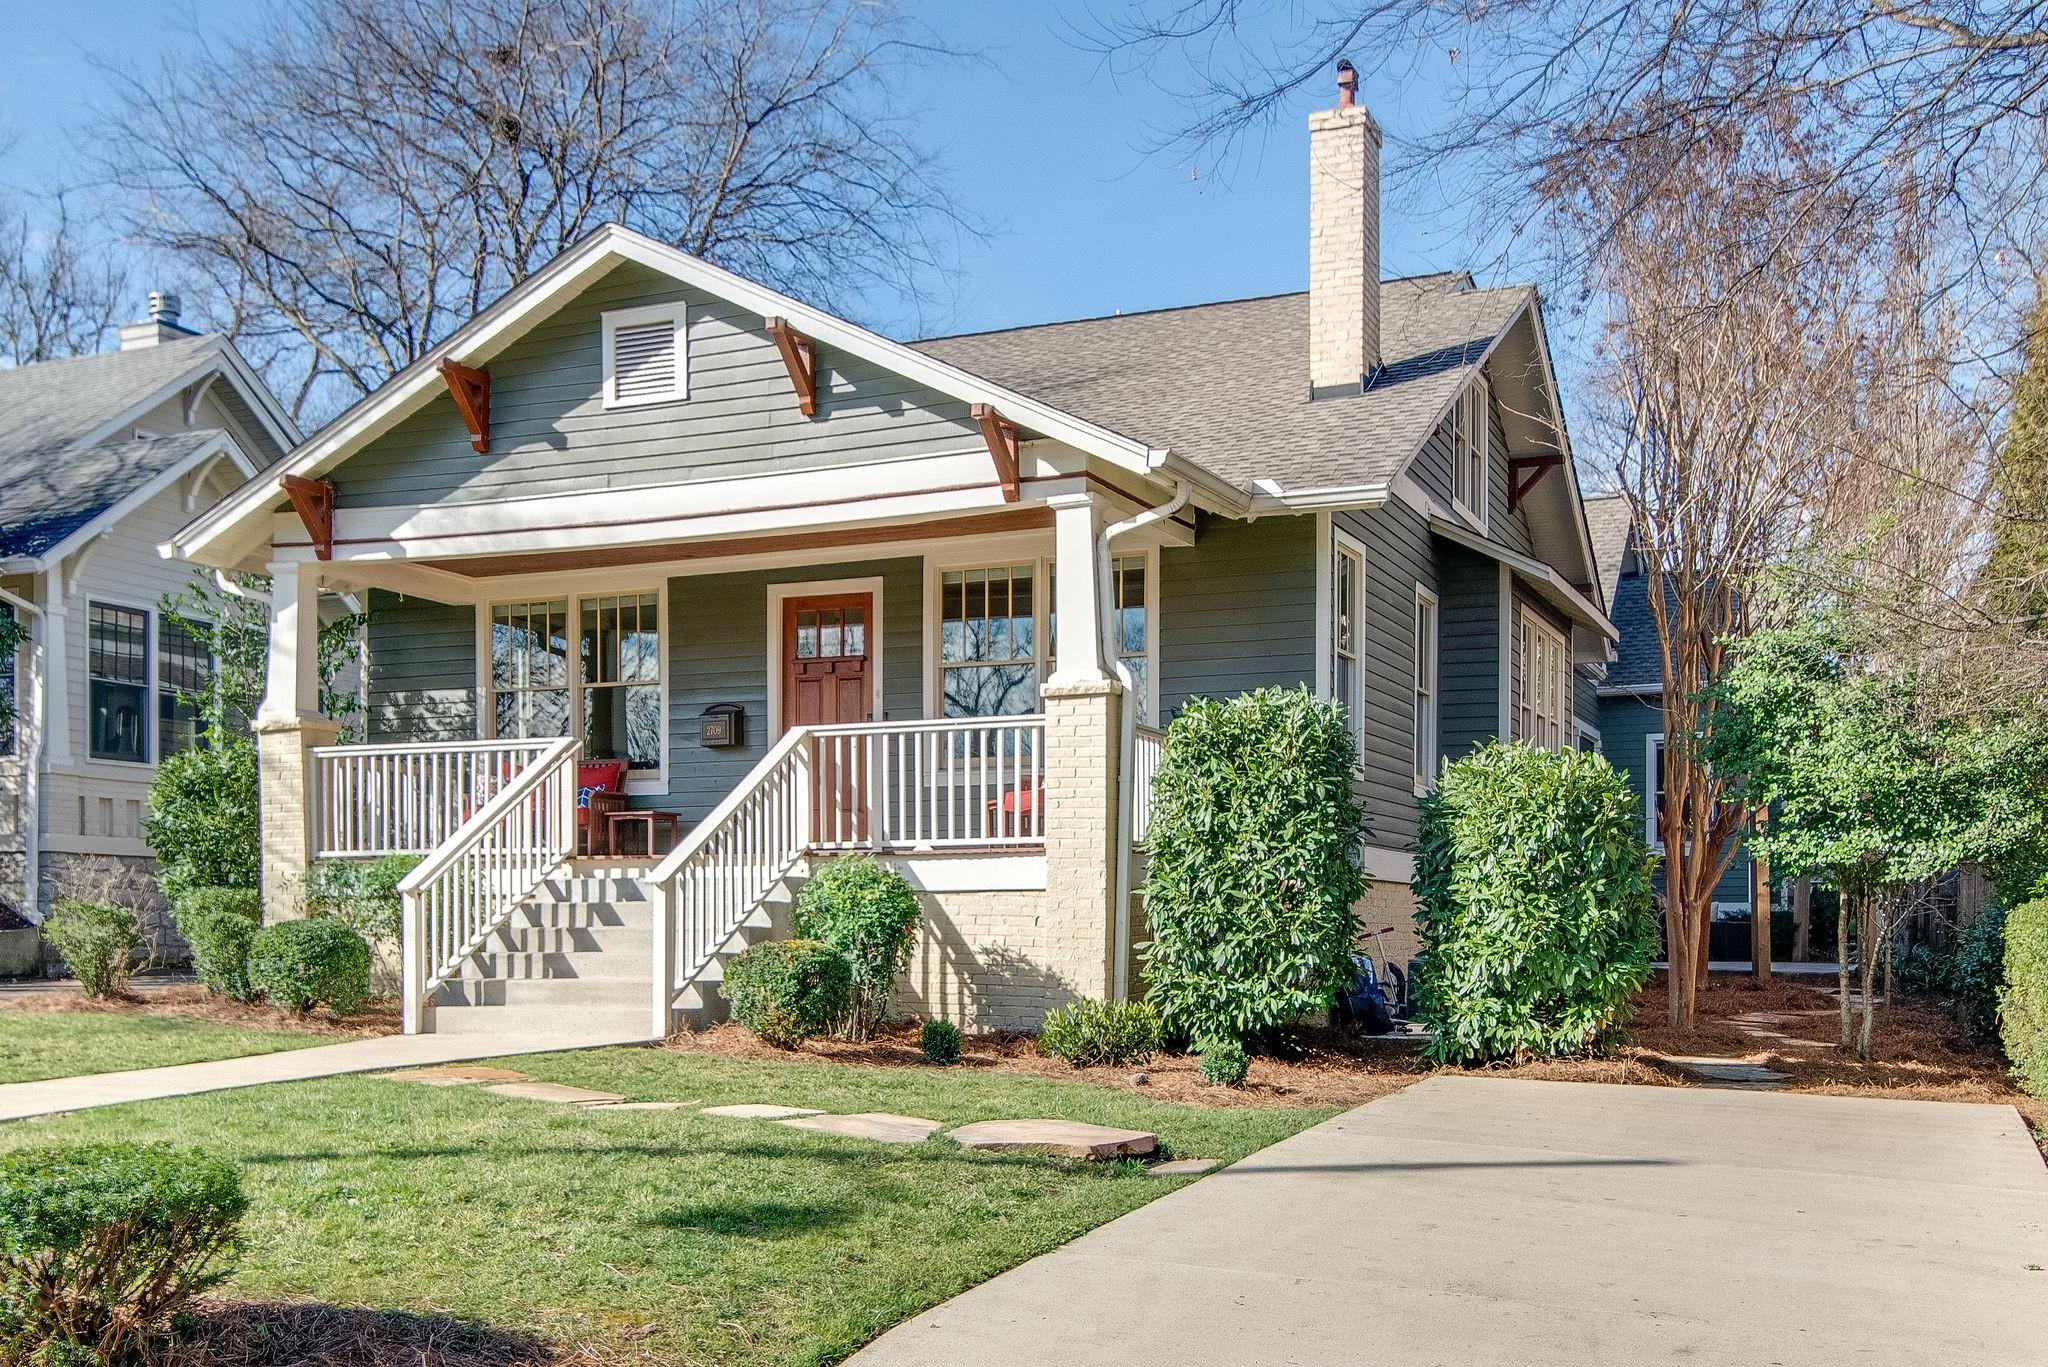 2709 Oakland Ave, Nashville, TN 37212 - Nashville, TN real estate listing